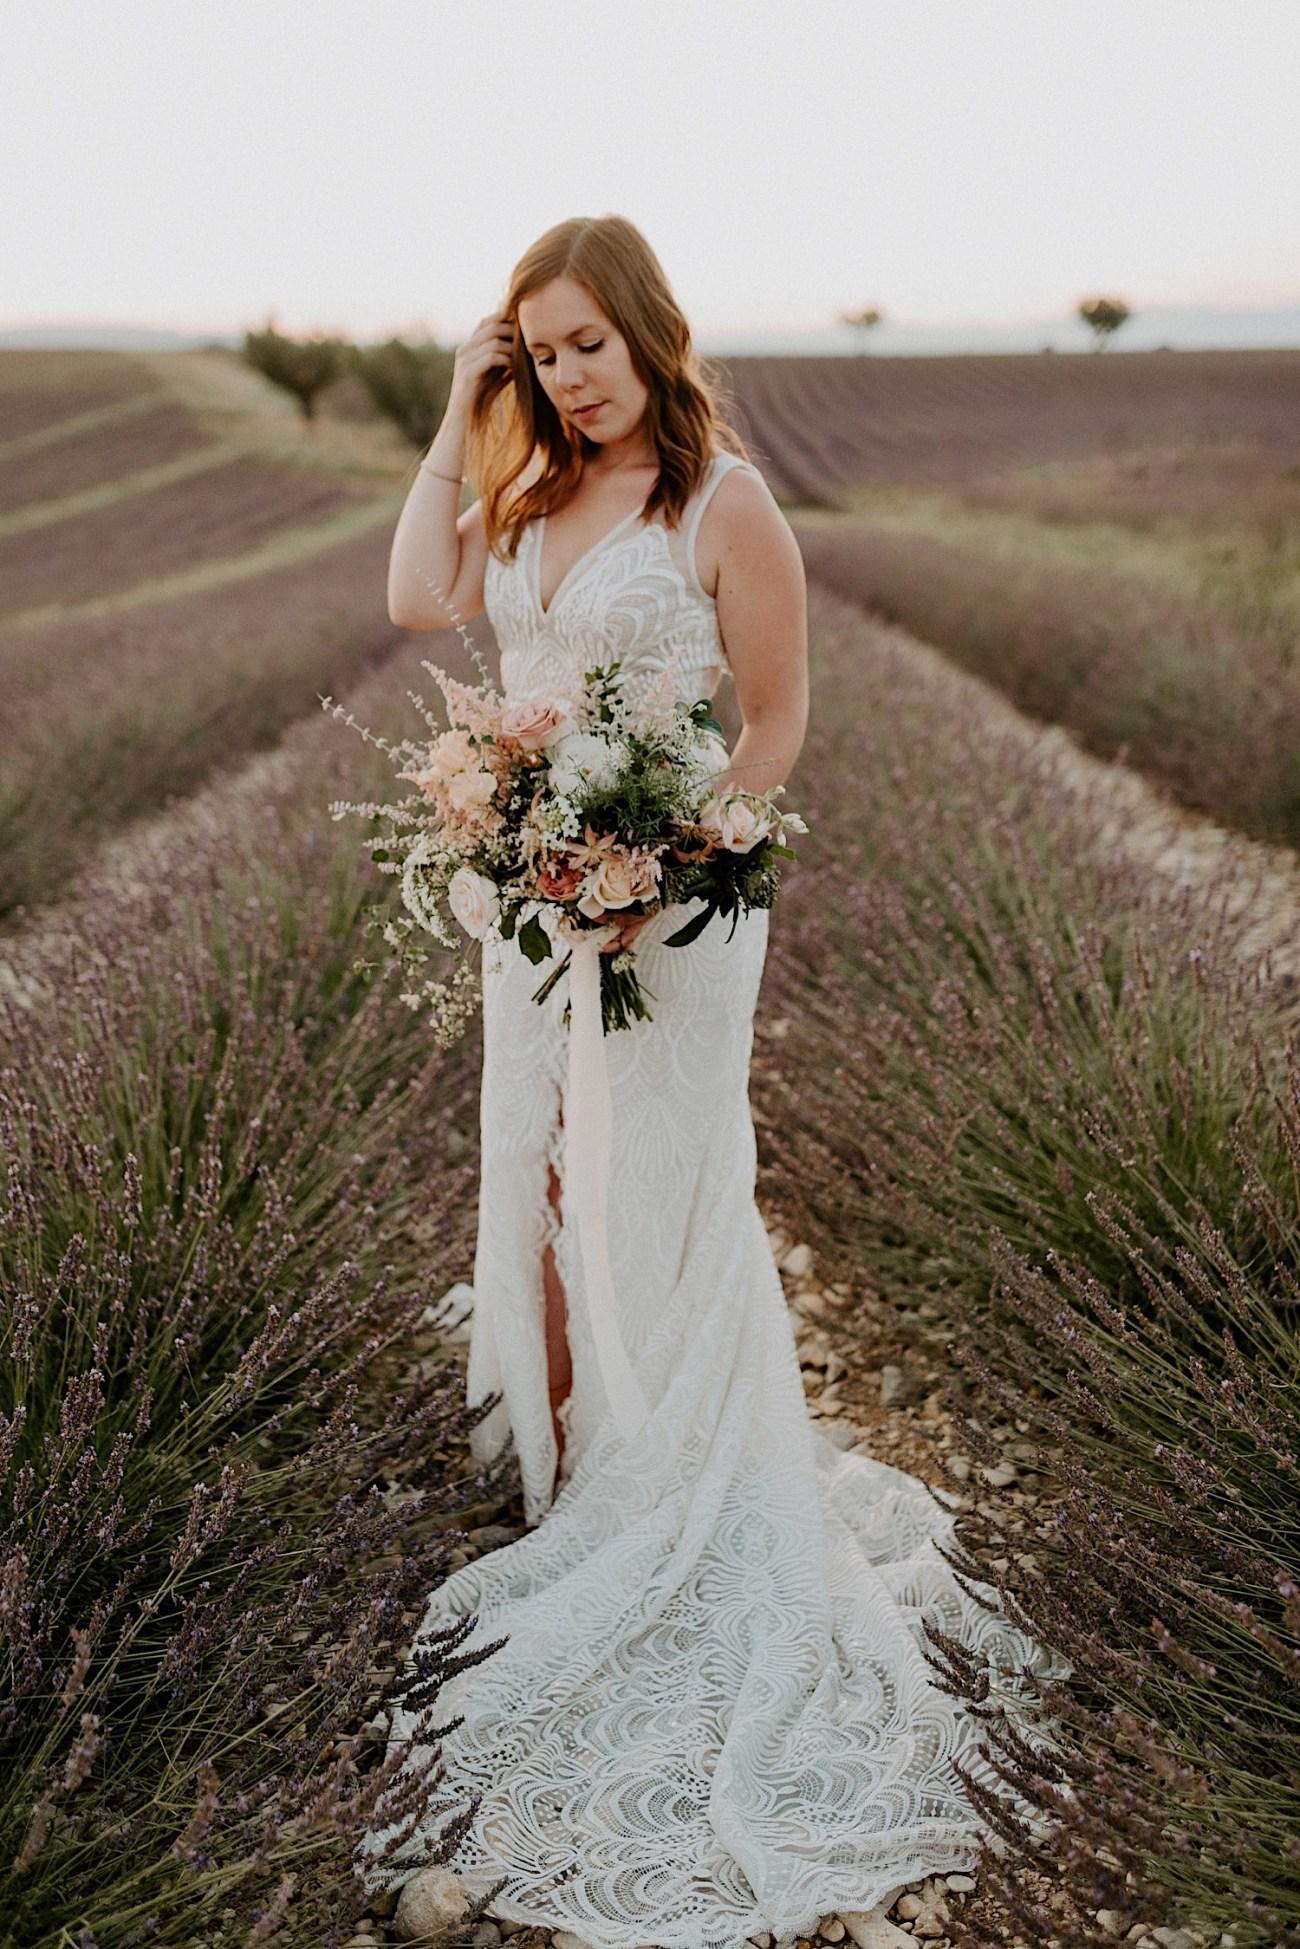 Valensole Wedding Photos Lavender Field Wedding Provence Wedding French Wedding Photographer Destination Wedding France Anais Possamai Photography 11